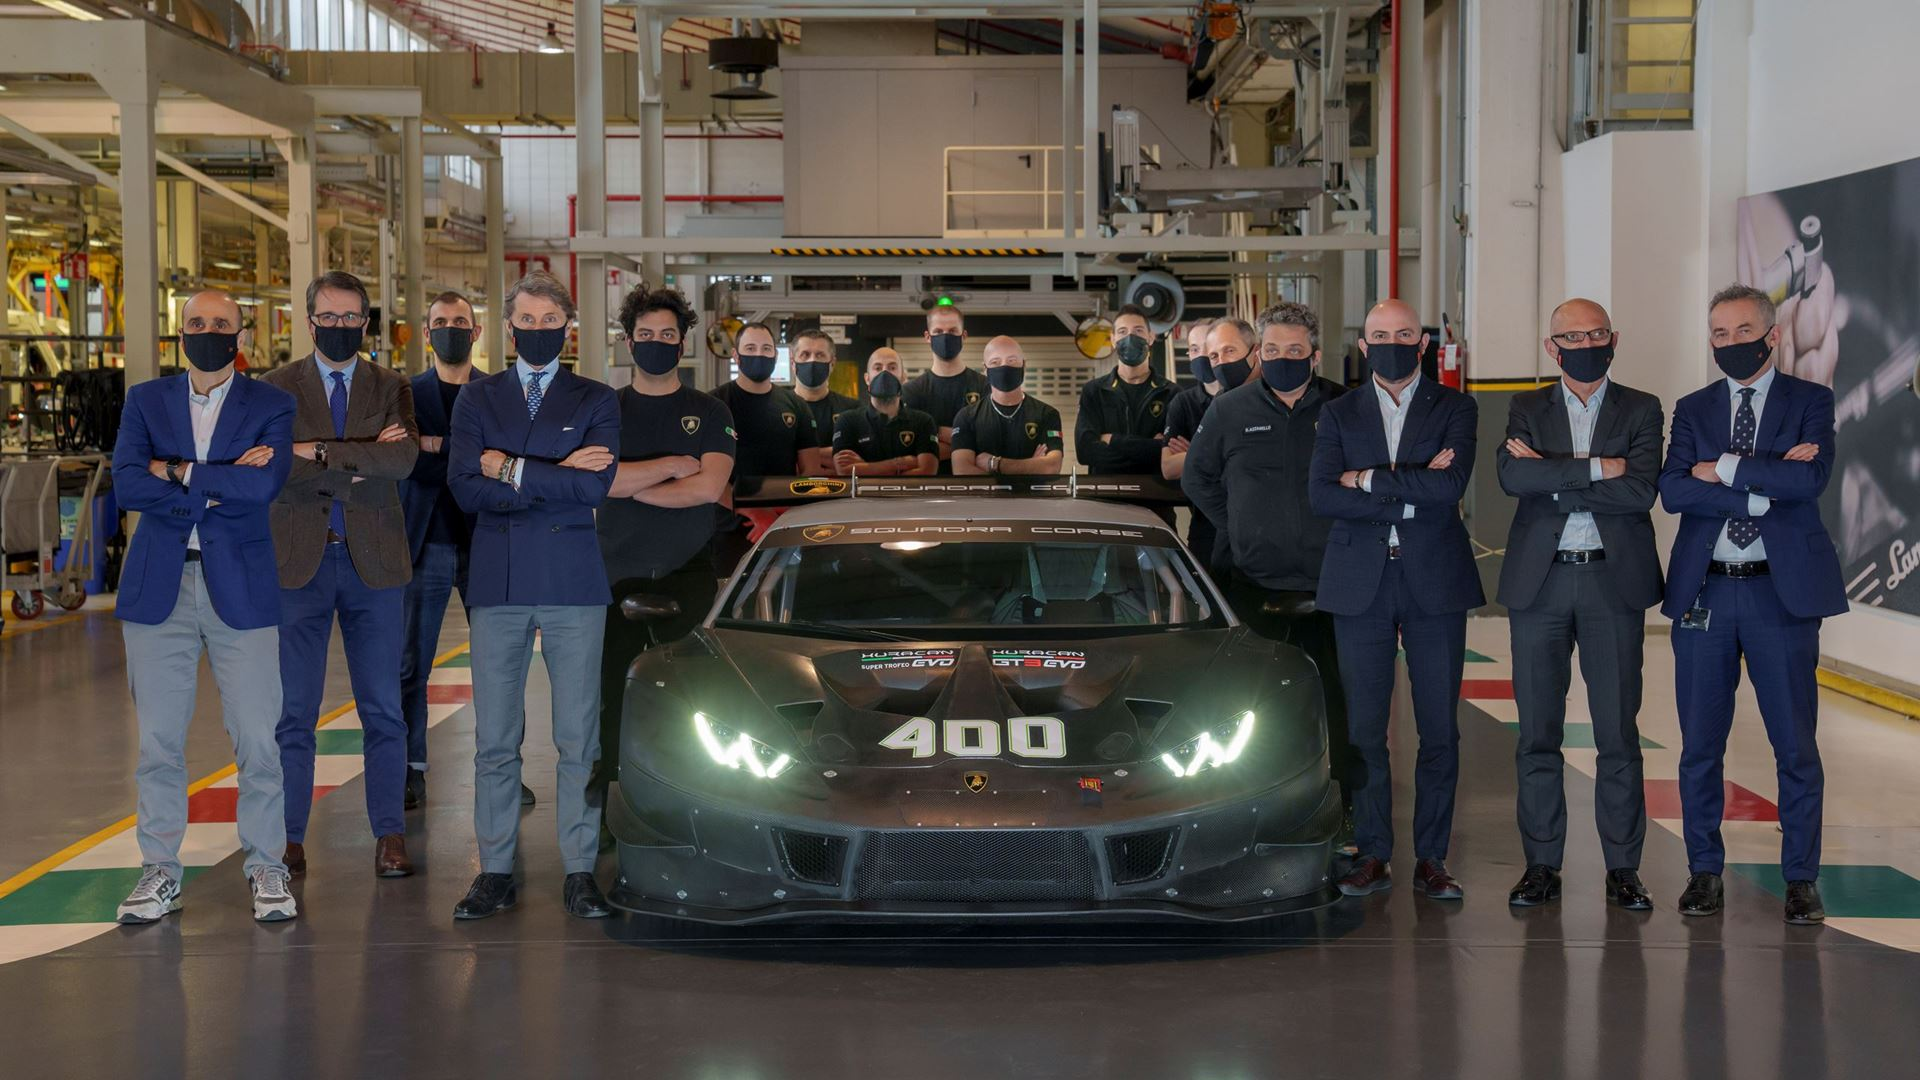 Lamborghini celebrates production of the 400th Huracán racing car - Image 3